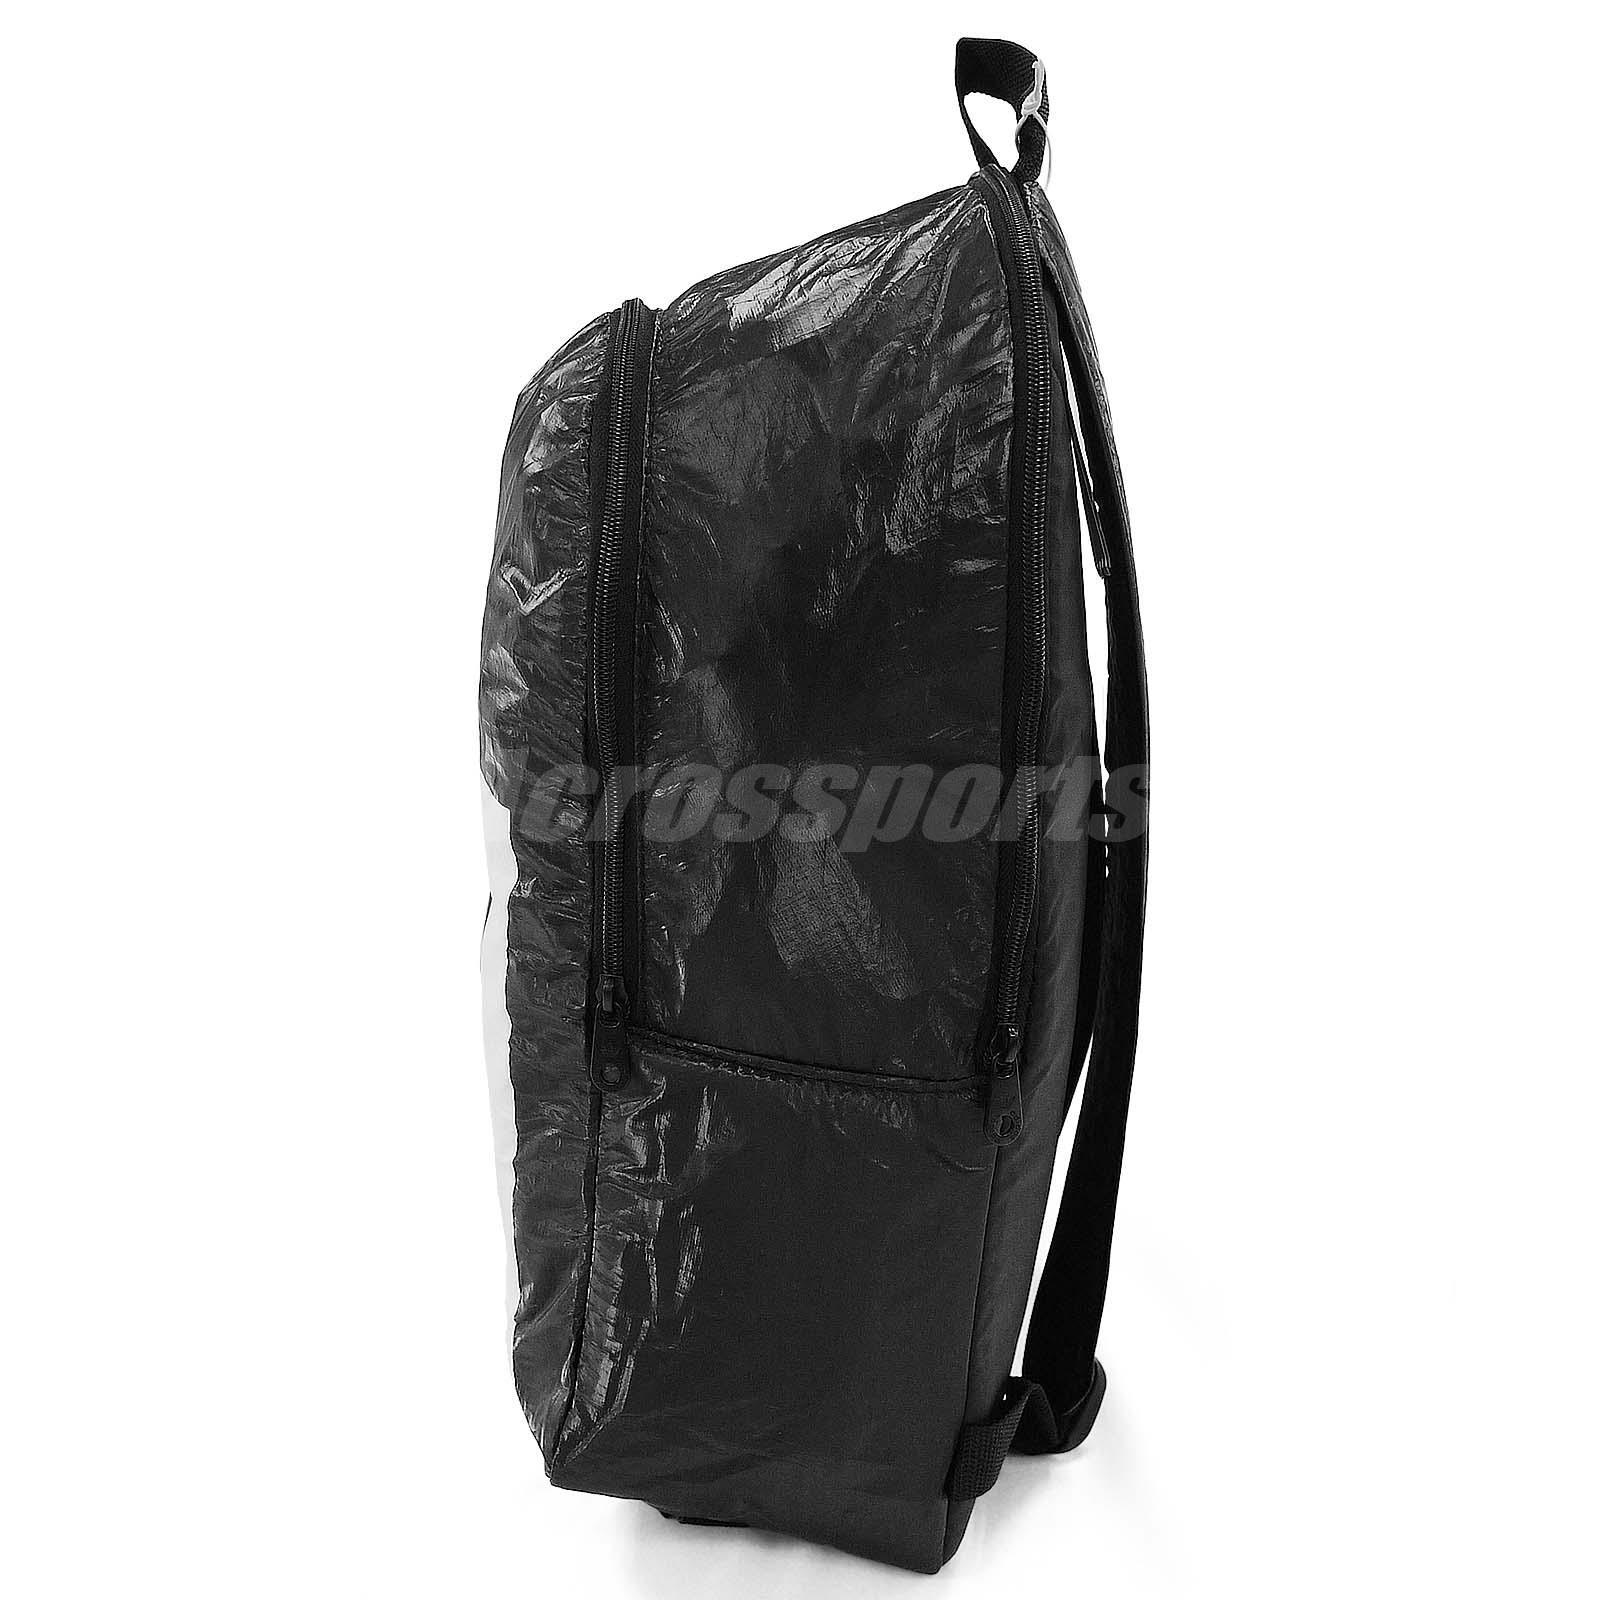 386fae54f3 adidas Performance Berlin Backpack Black White 3-Stripes Book Bag ...